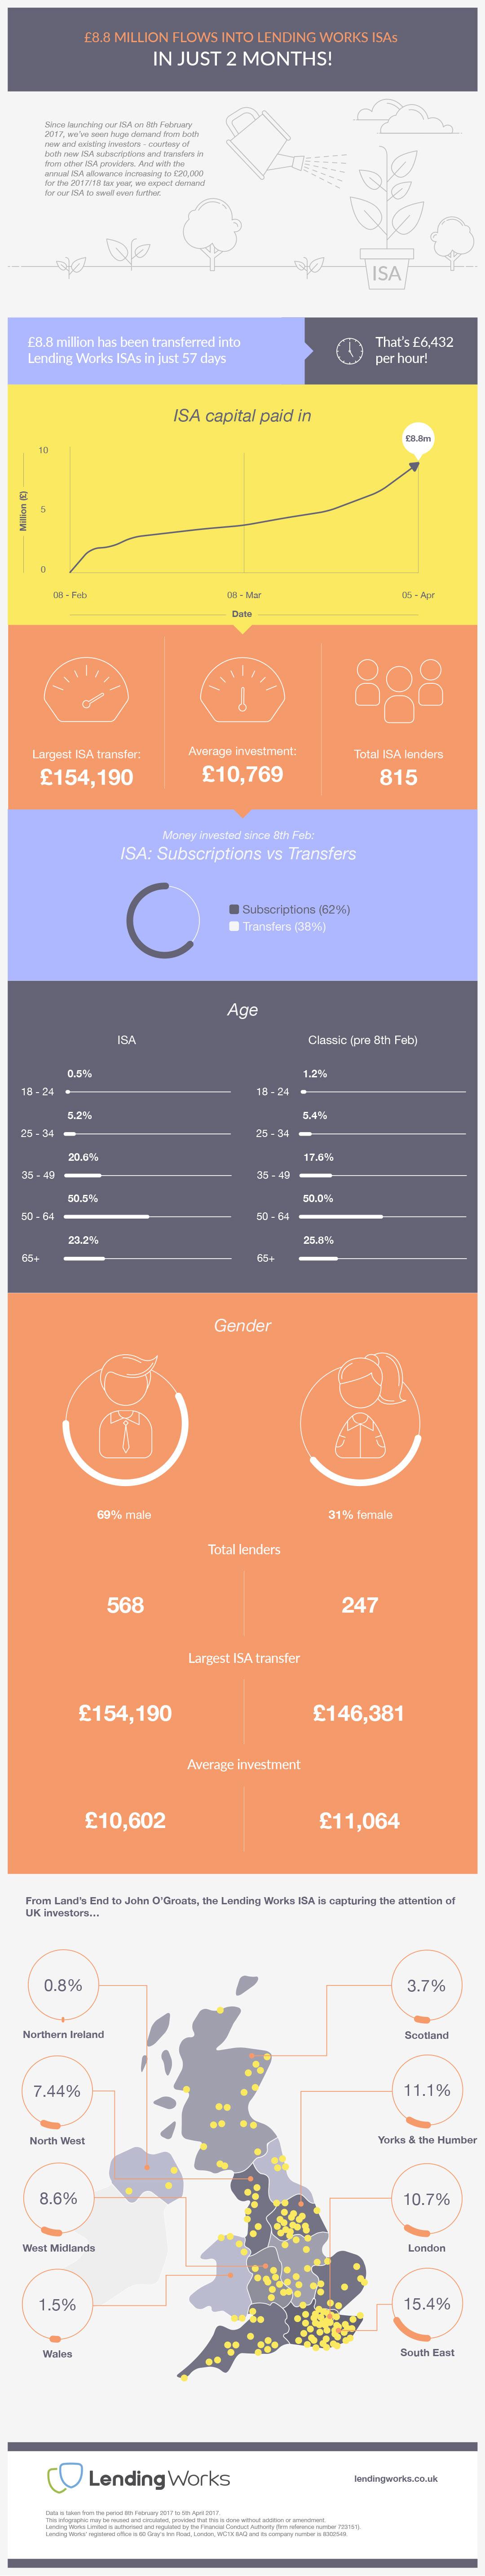 ISA_Infographic (1)